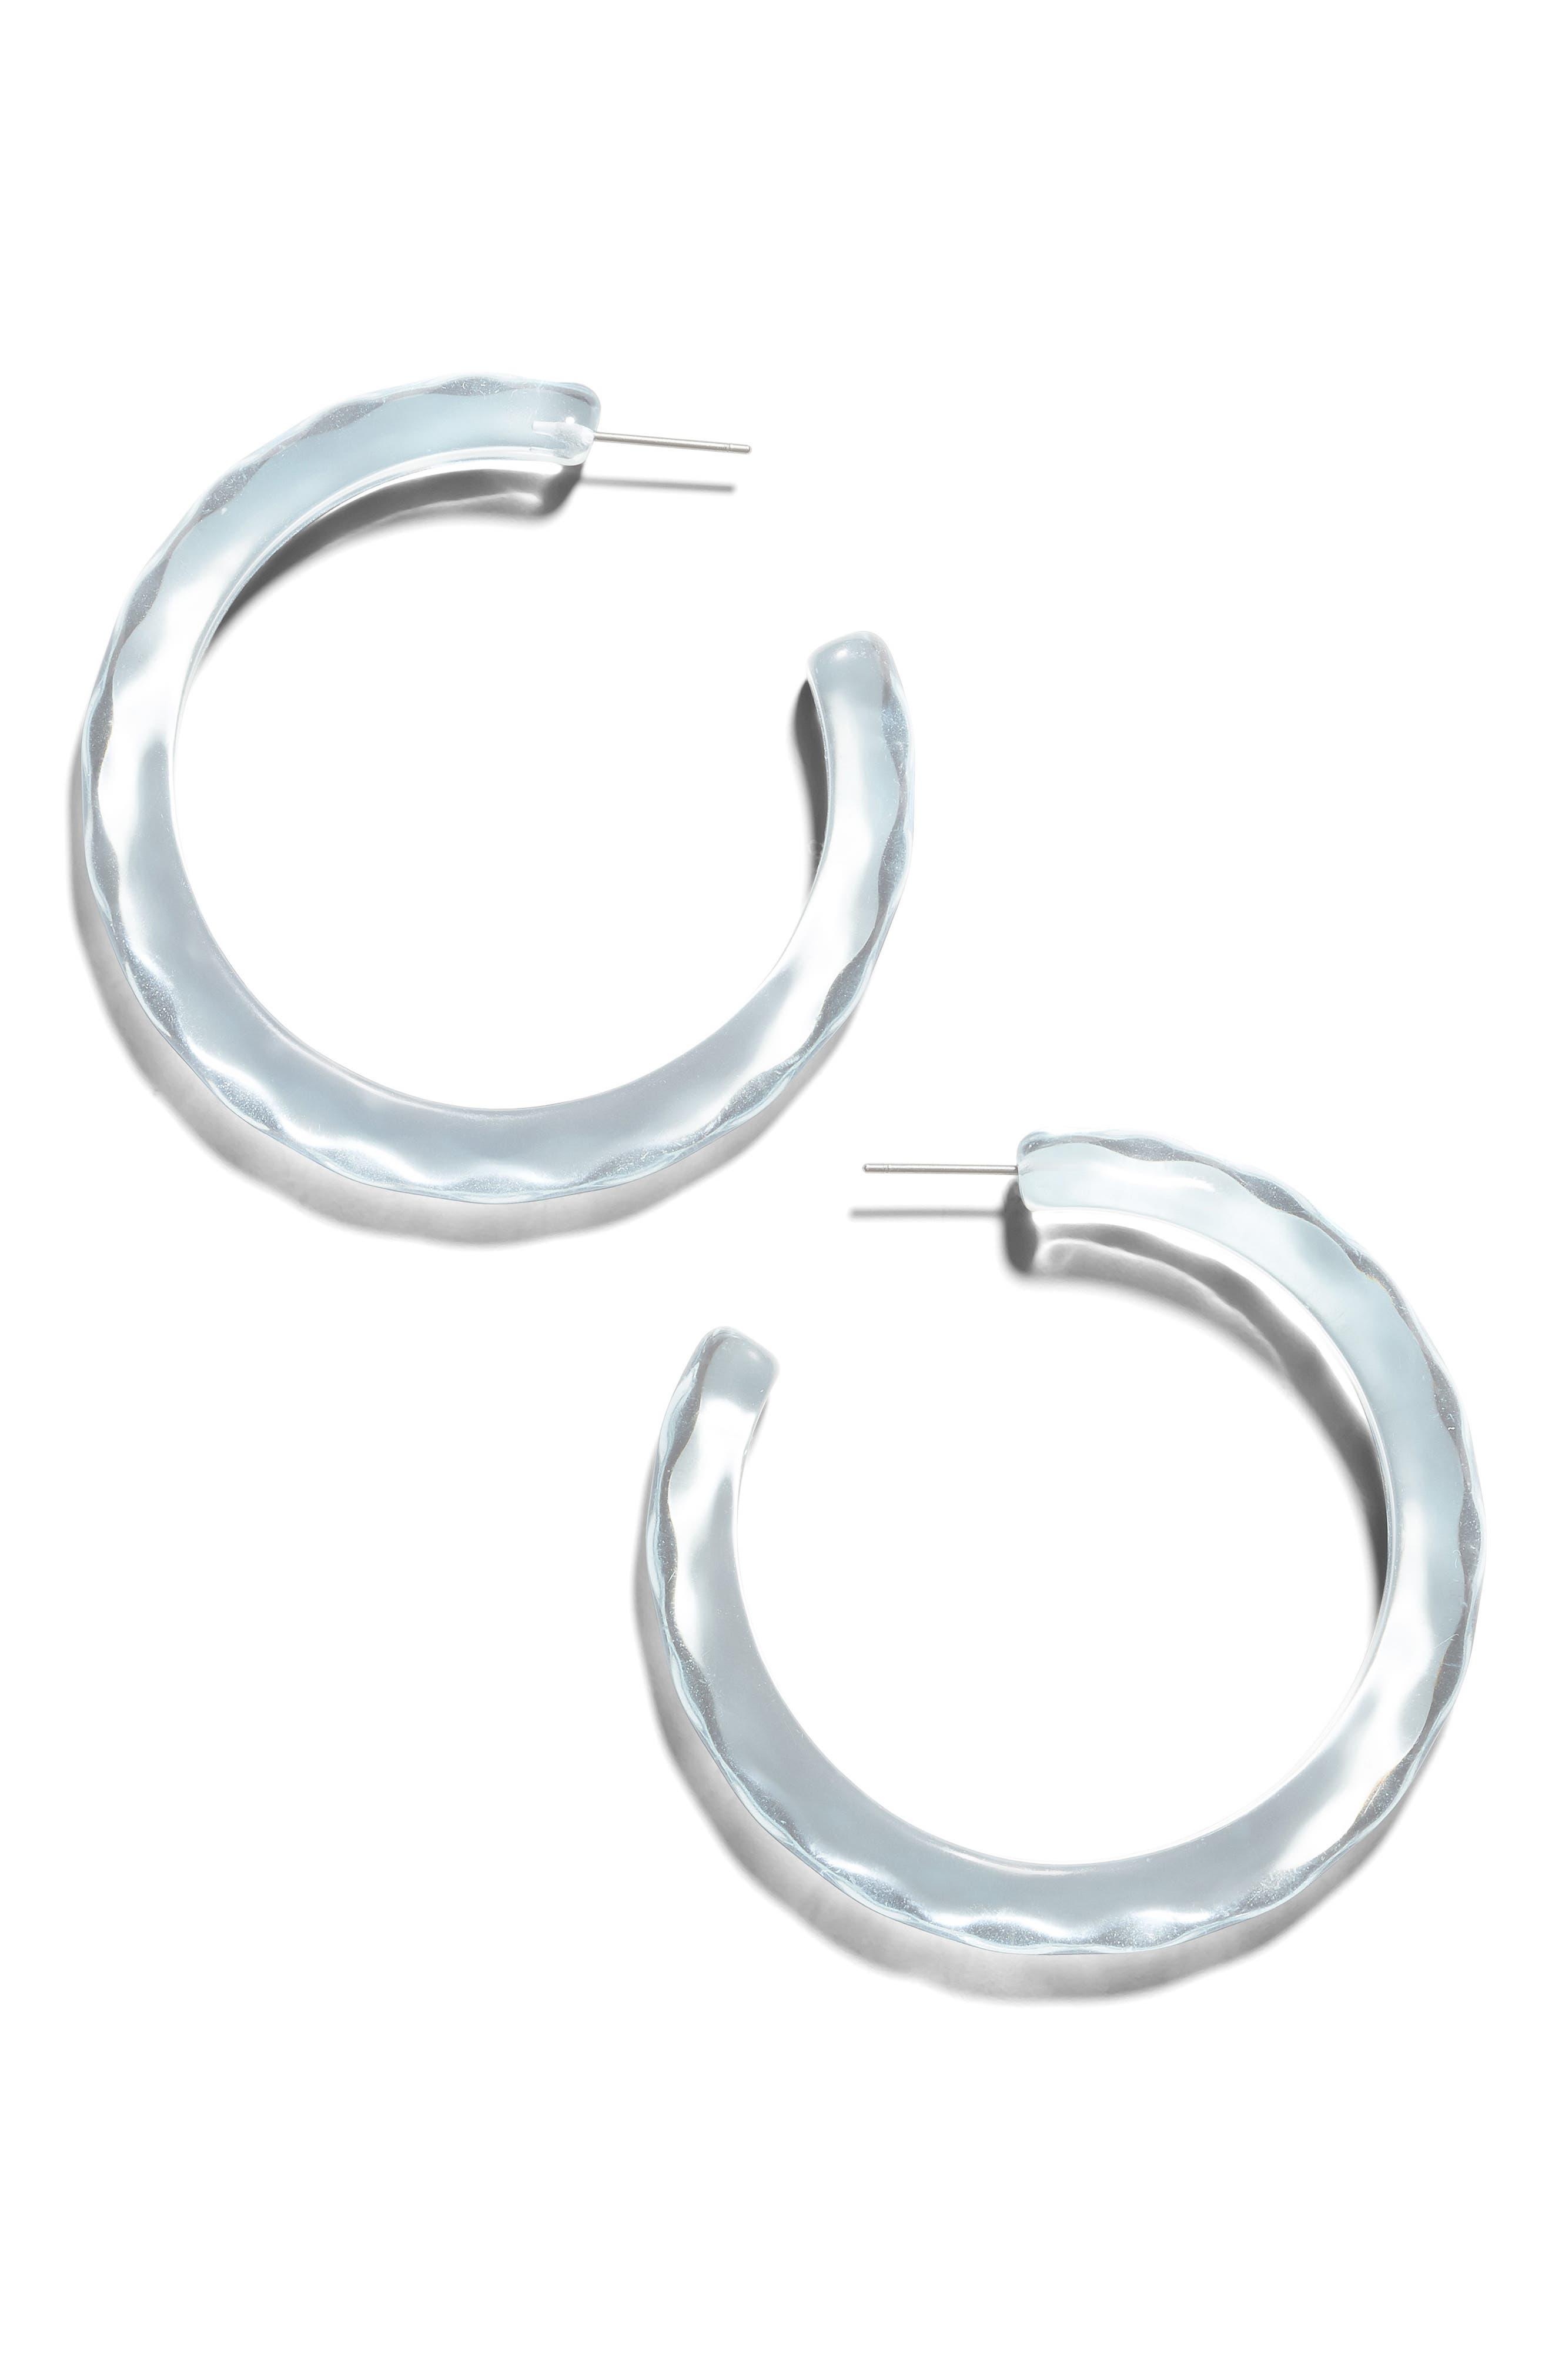 BAUBLEBAR, Helia Medium Textured Hoop Earrings, Main thumbnail 1, color, BLUE